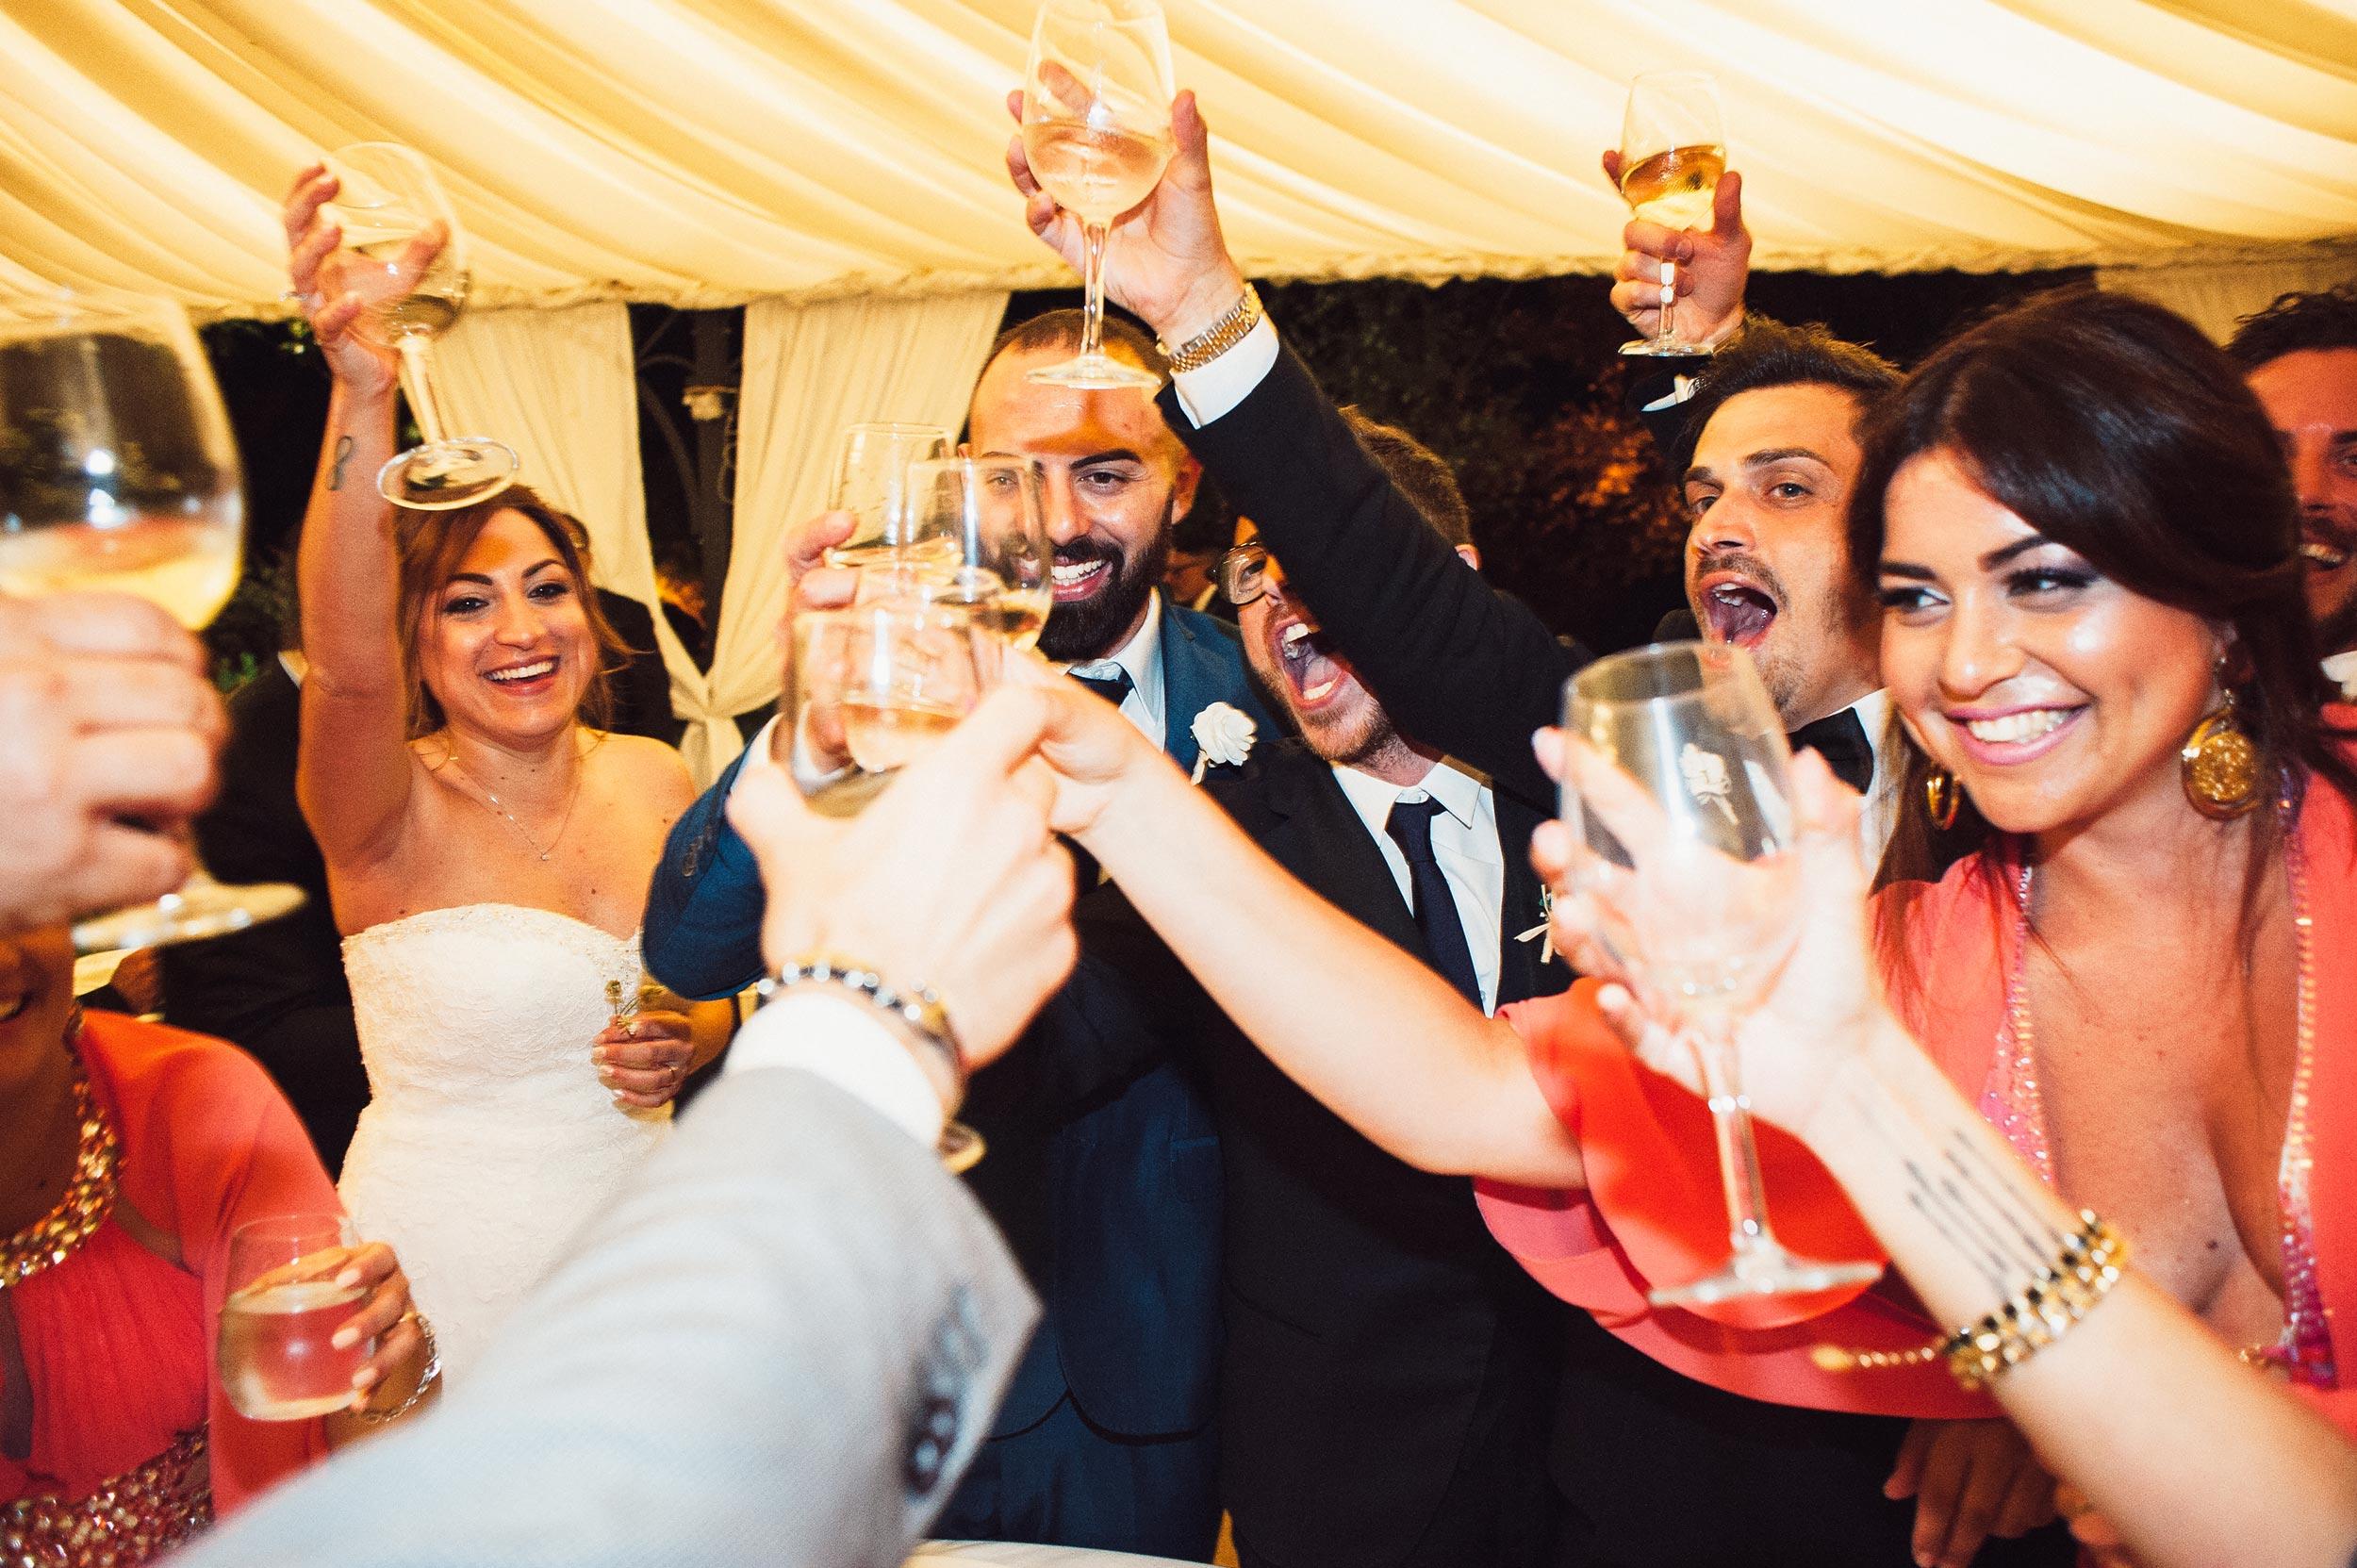 2016-Claudio-Teresa-Naples-Wedding-Photographer-Italy-Alessandro-Avenali-91.jpg